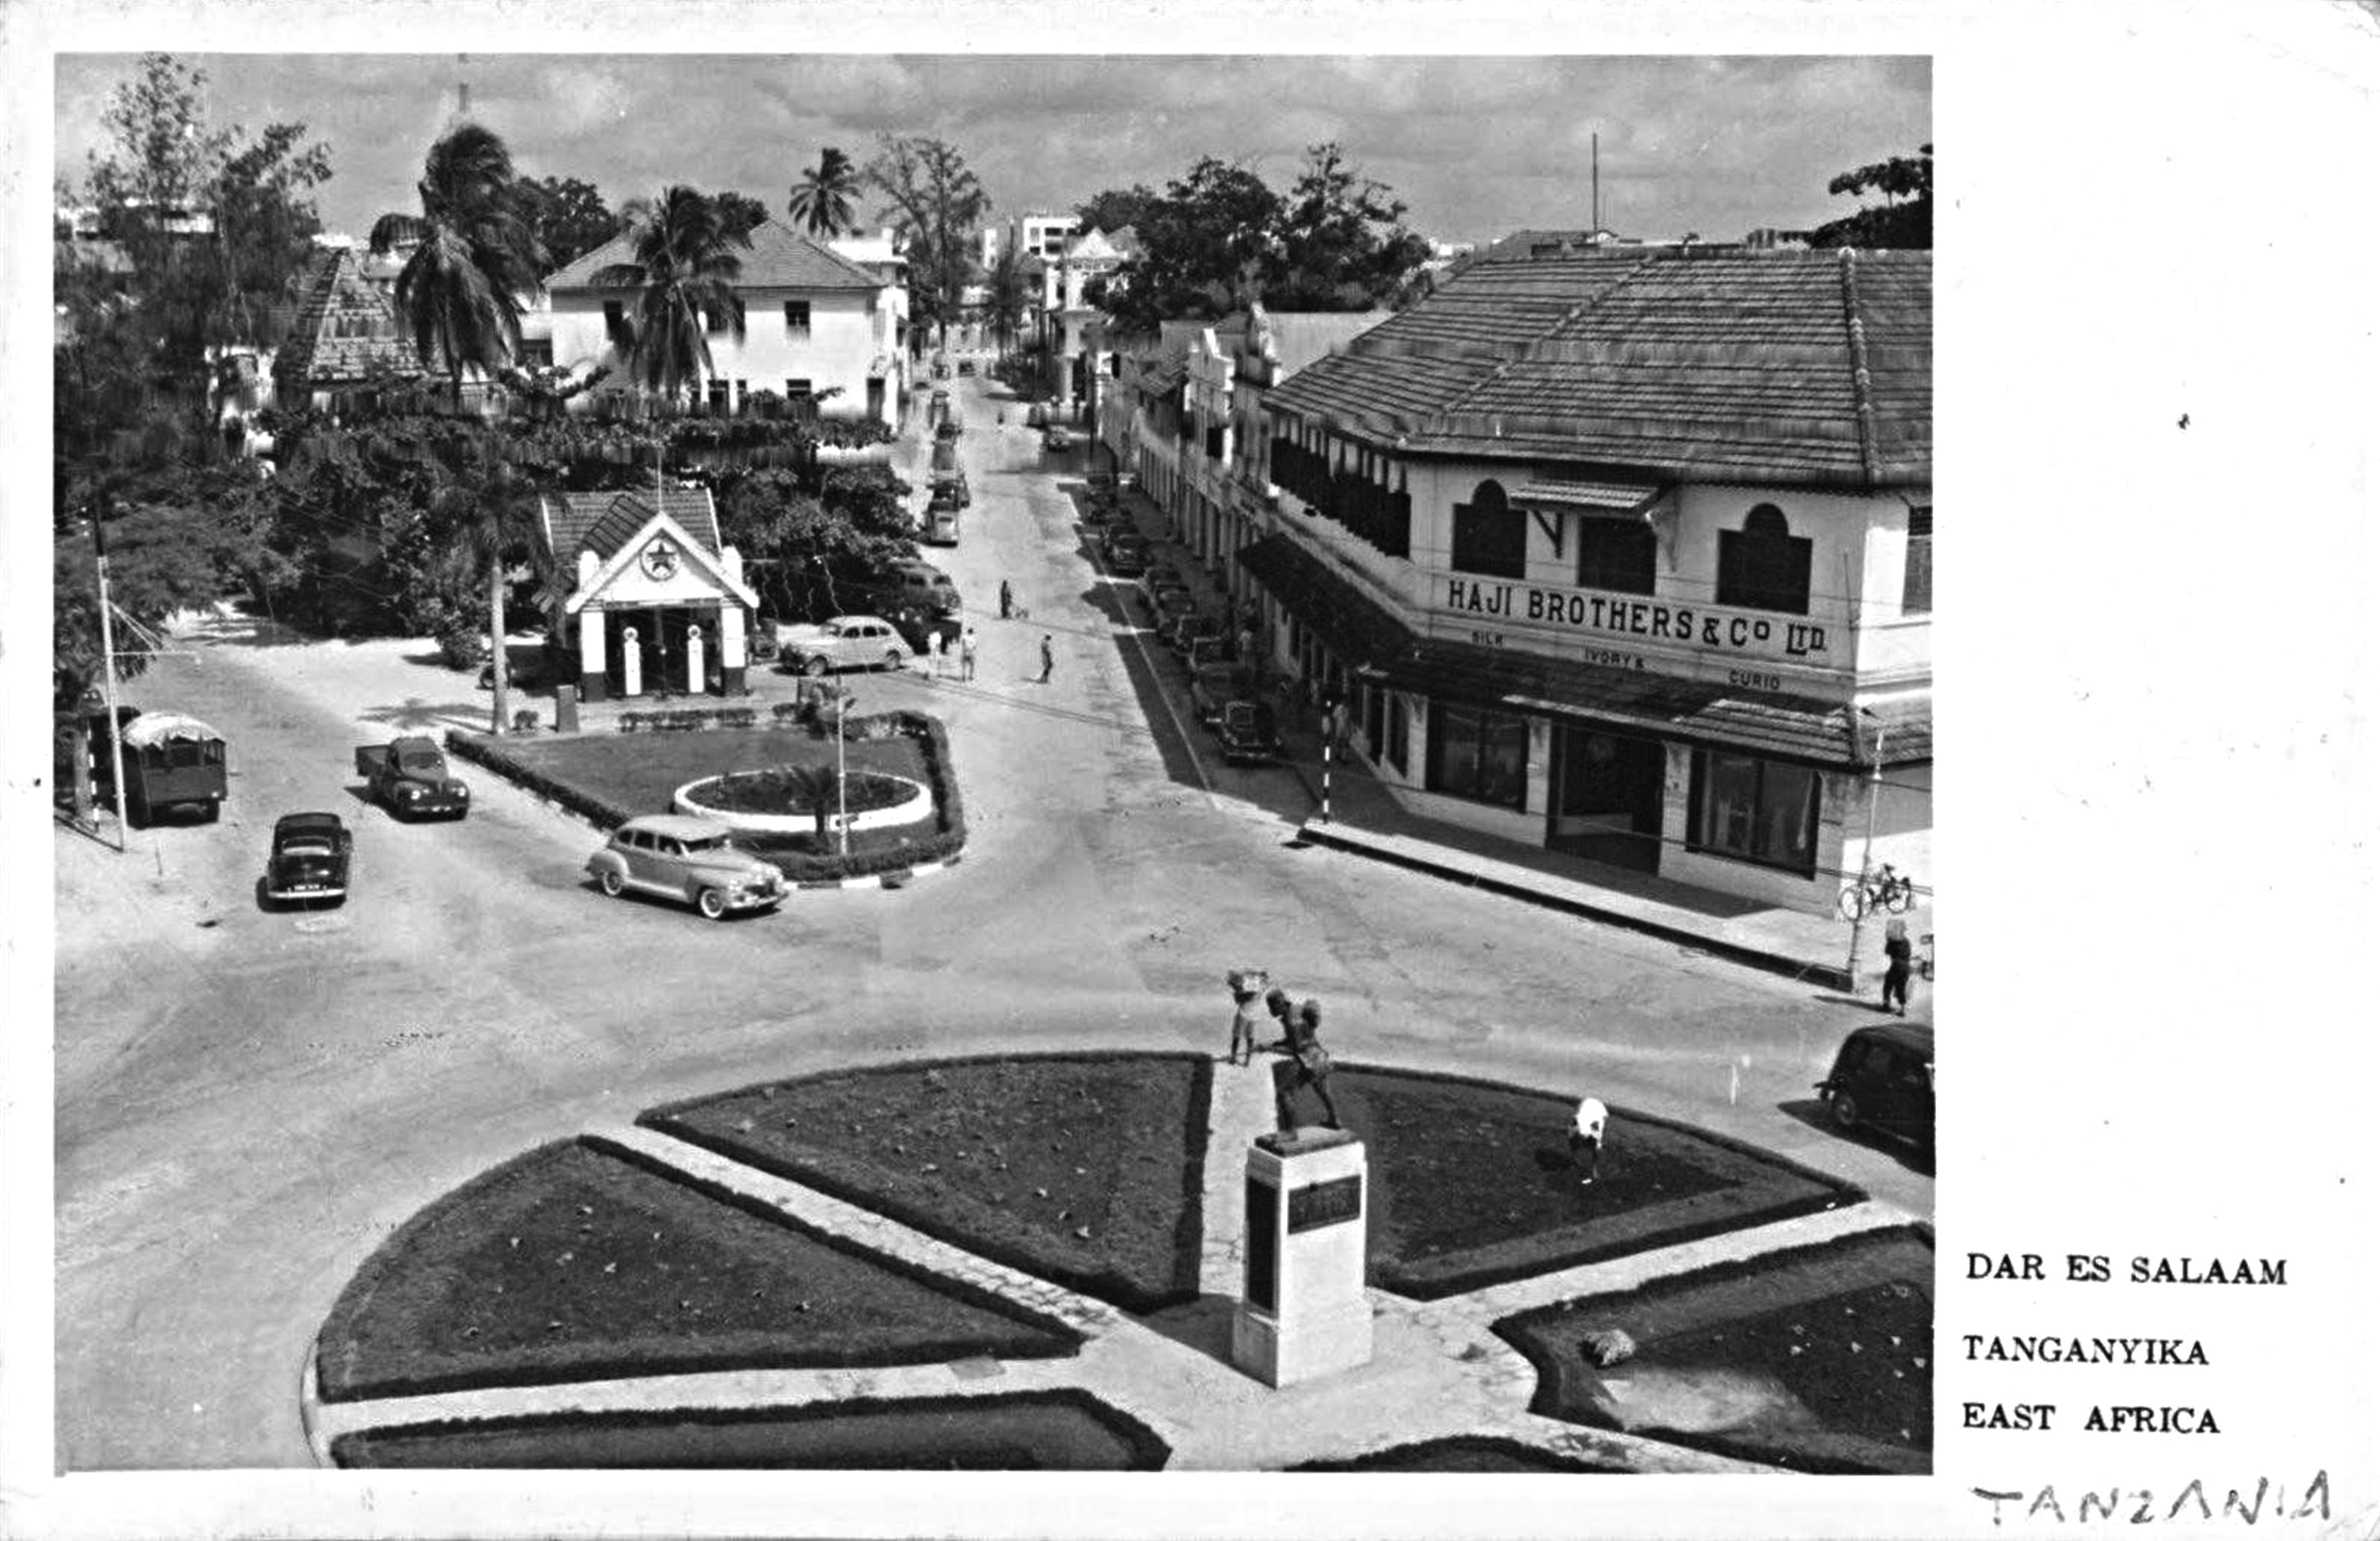 Dar es salaam Image Archive2